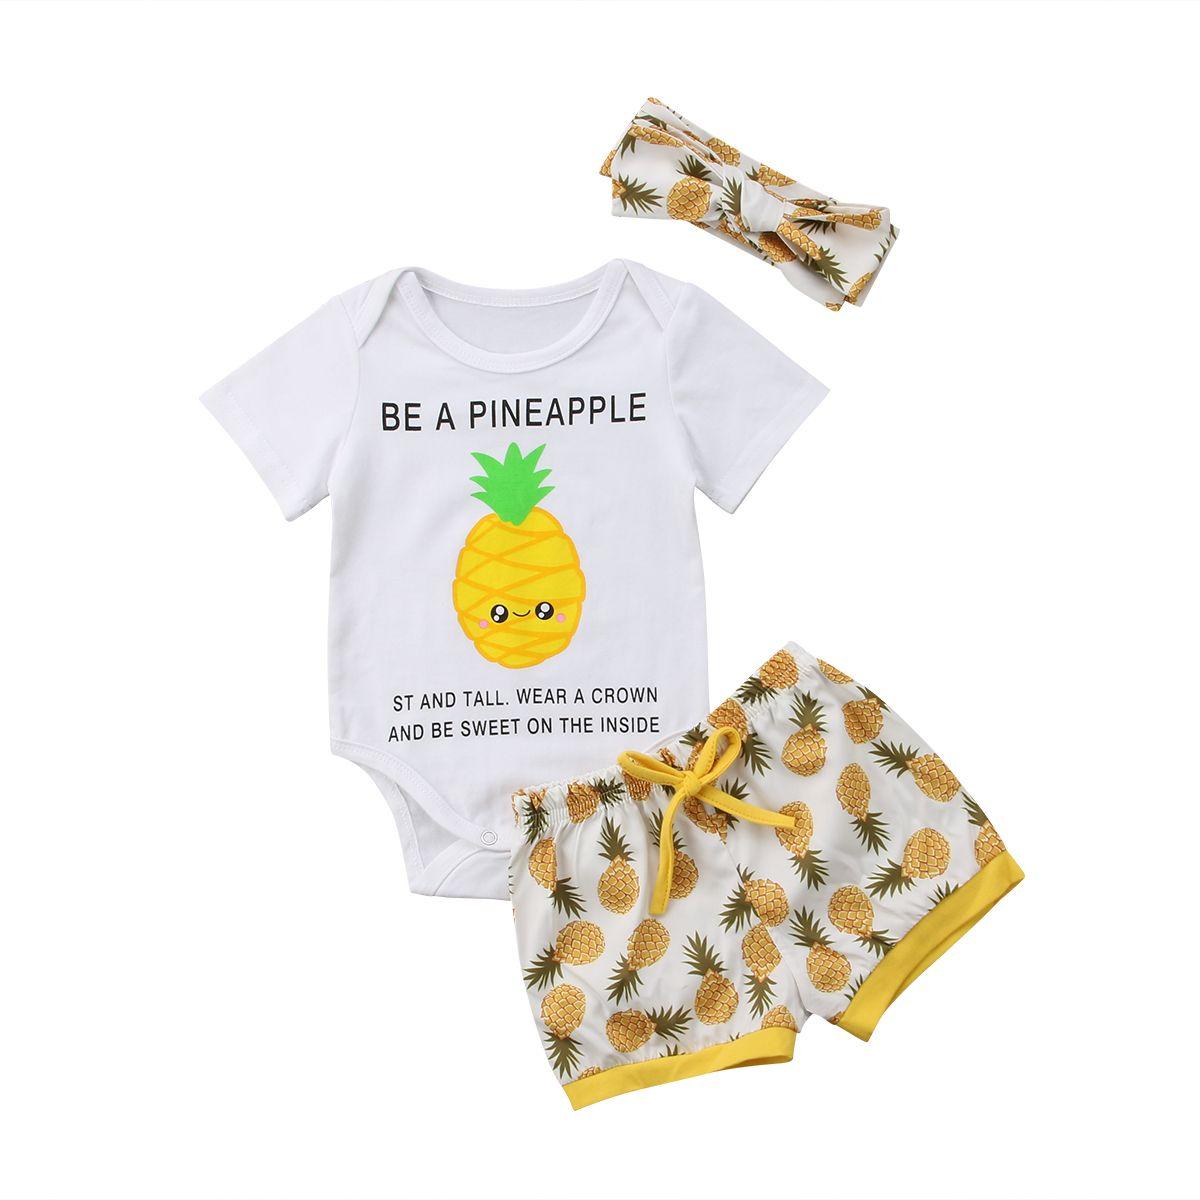 e961e2b442ae 2019 Newborn Baby Boy Girl Pineapple Romper+Shorts Set Clothes ...